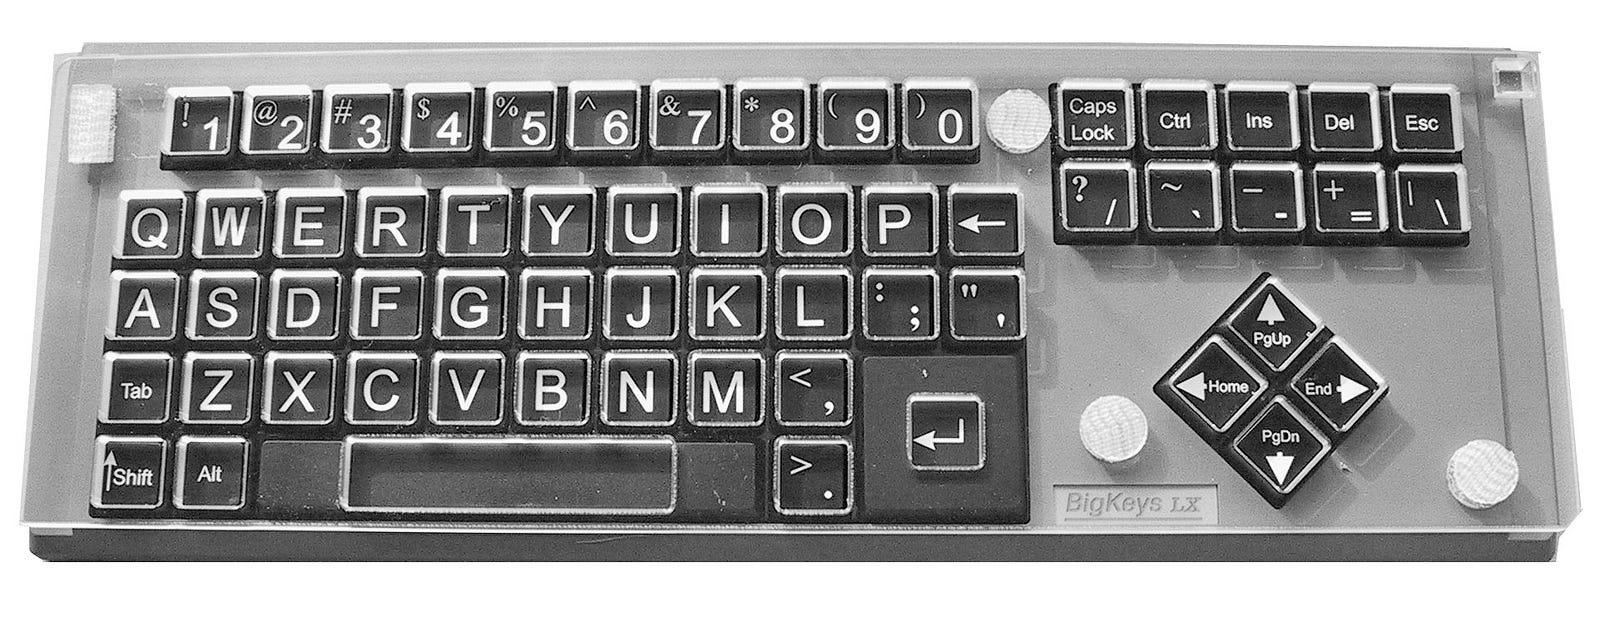 BigKeys LX Keyguard